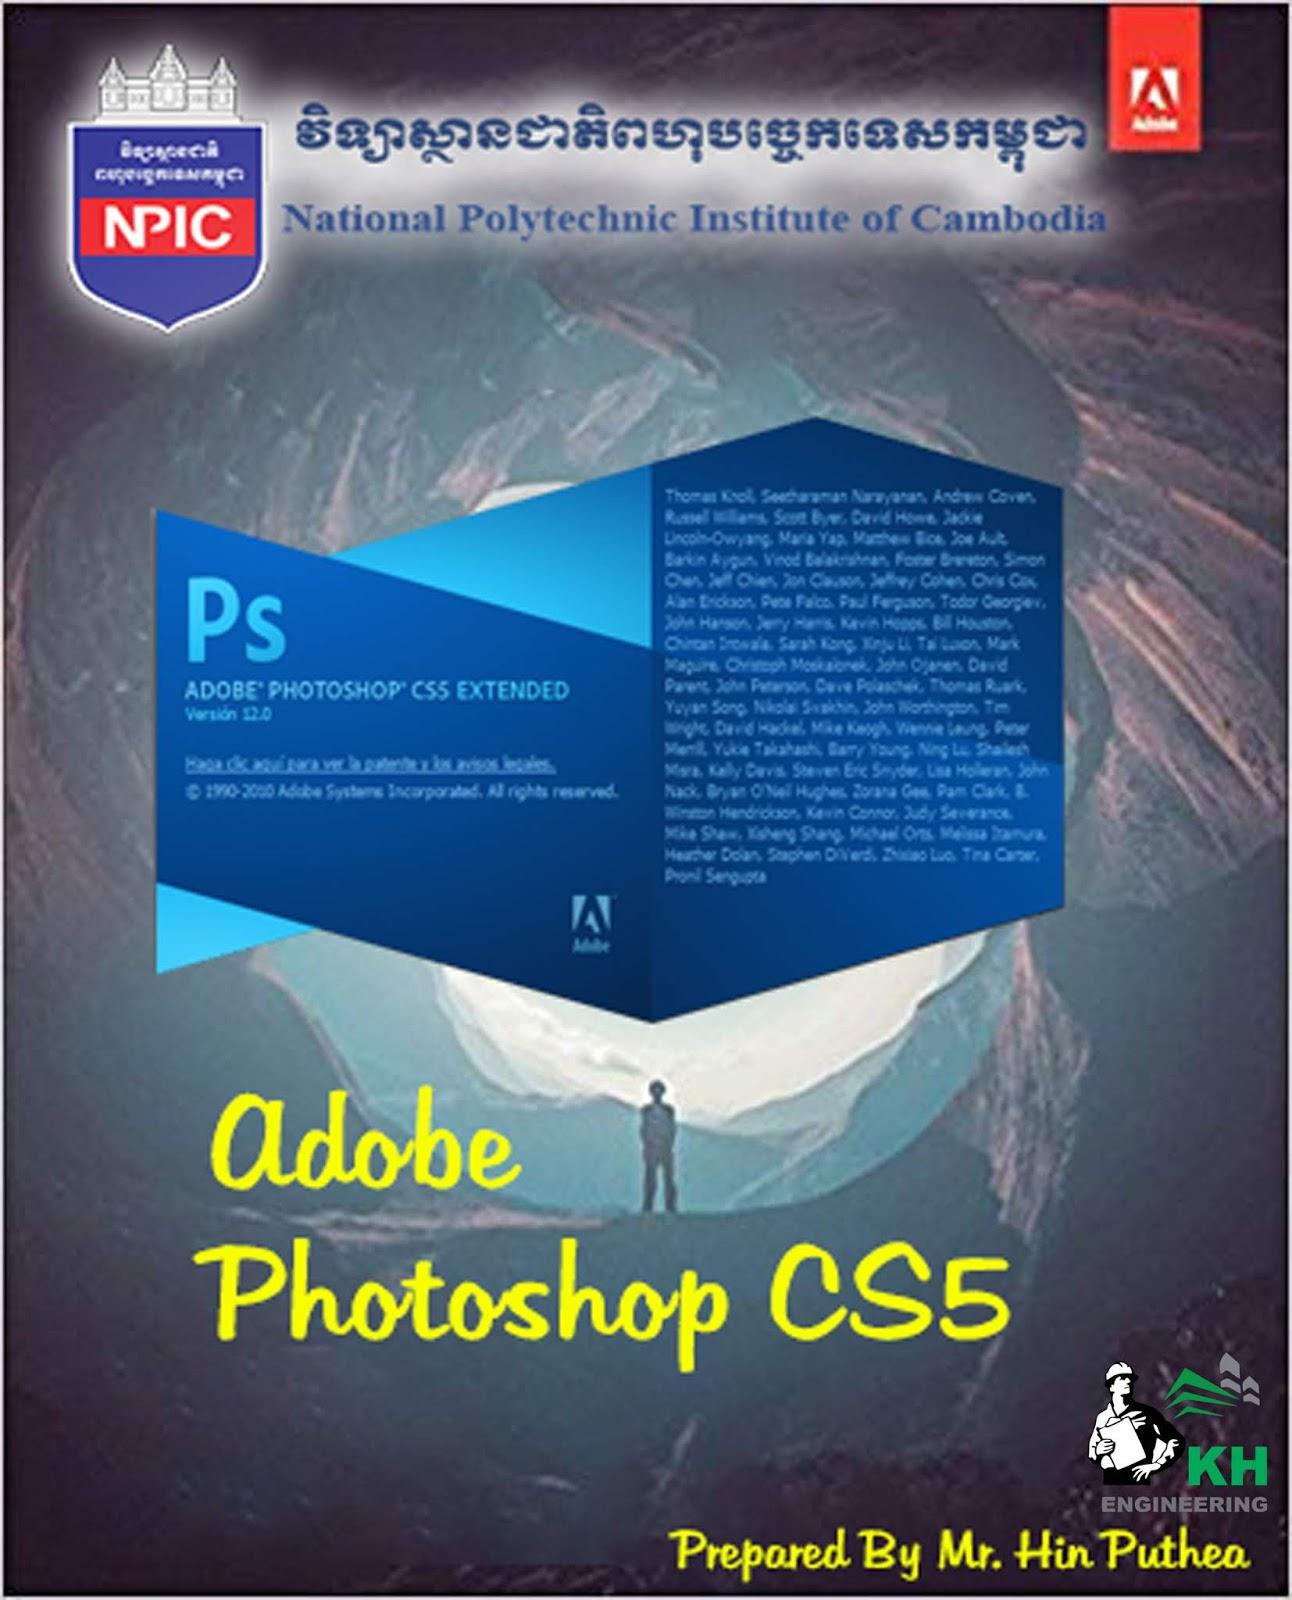 Photoshop CS5, Pro! Book 3